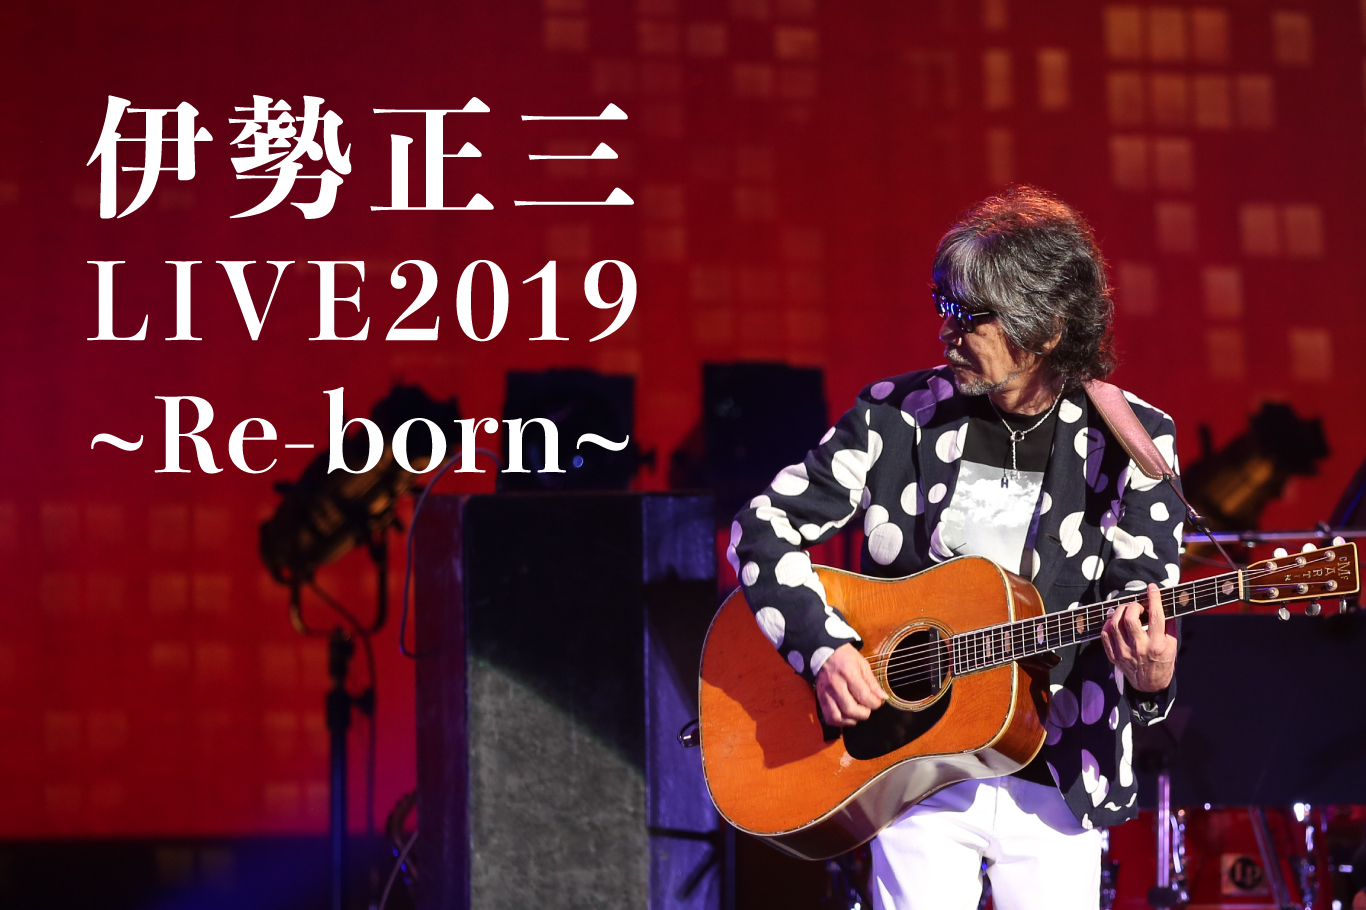 伊勢正三LIVE2019〜Re-born〜 日程一覧